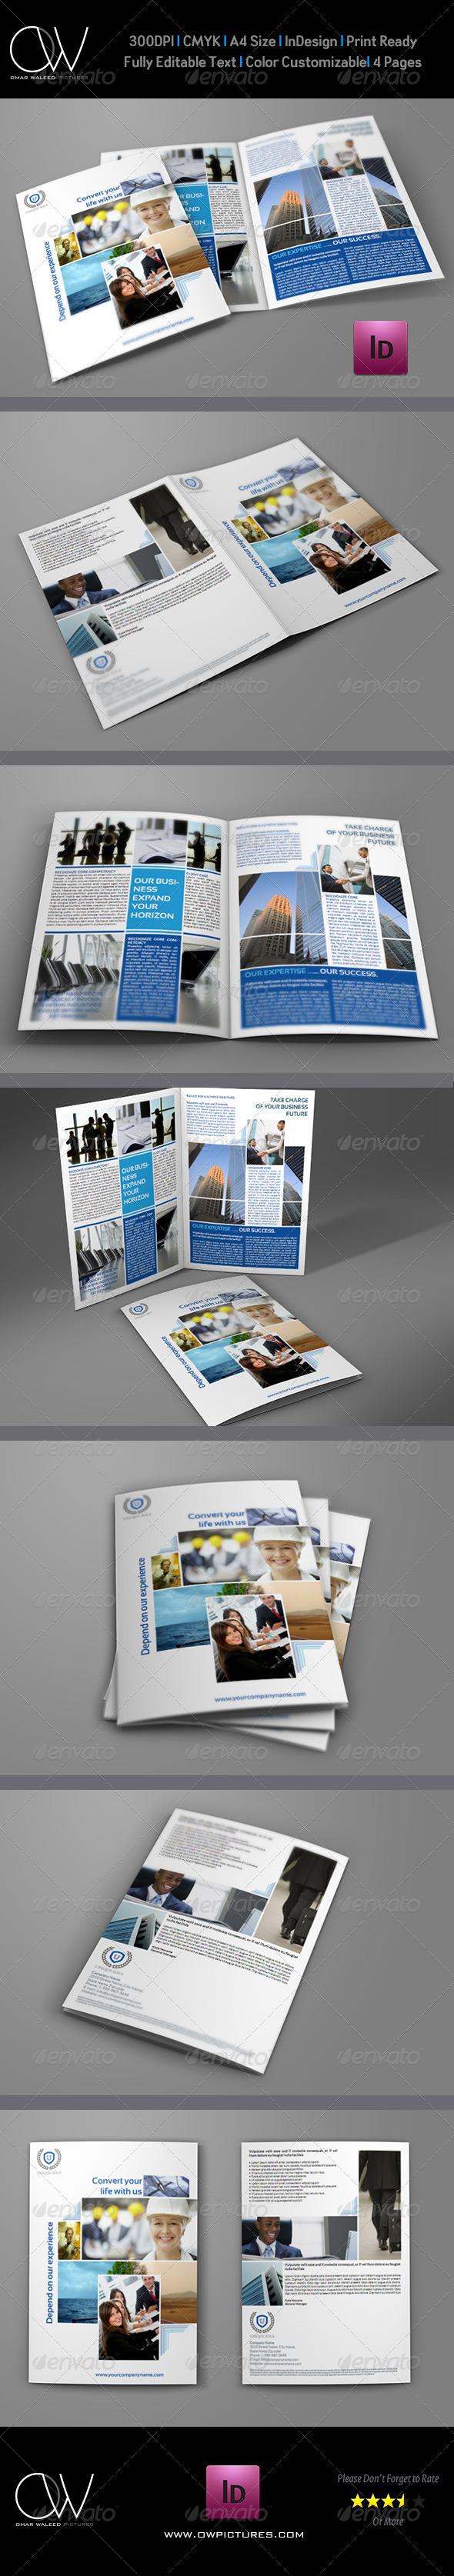 Company Brochure Bi-Fold Template Vol.4 - Corporate Brochures